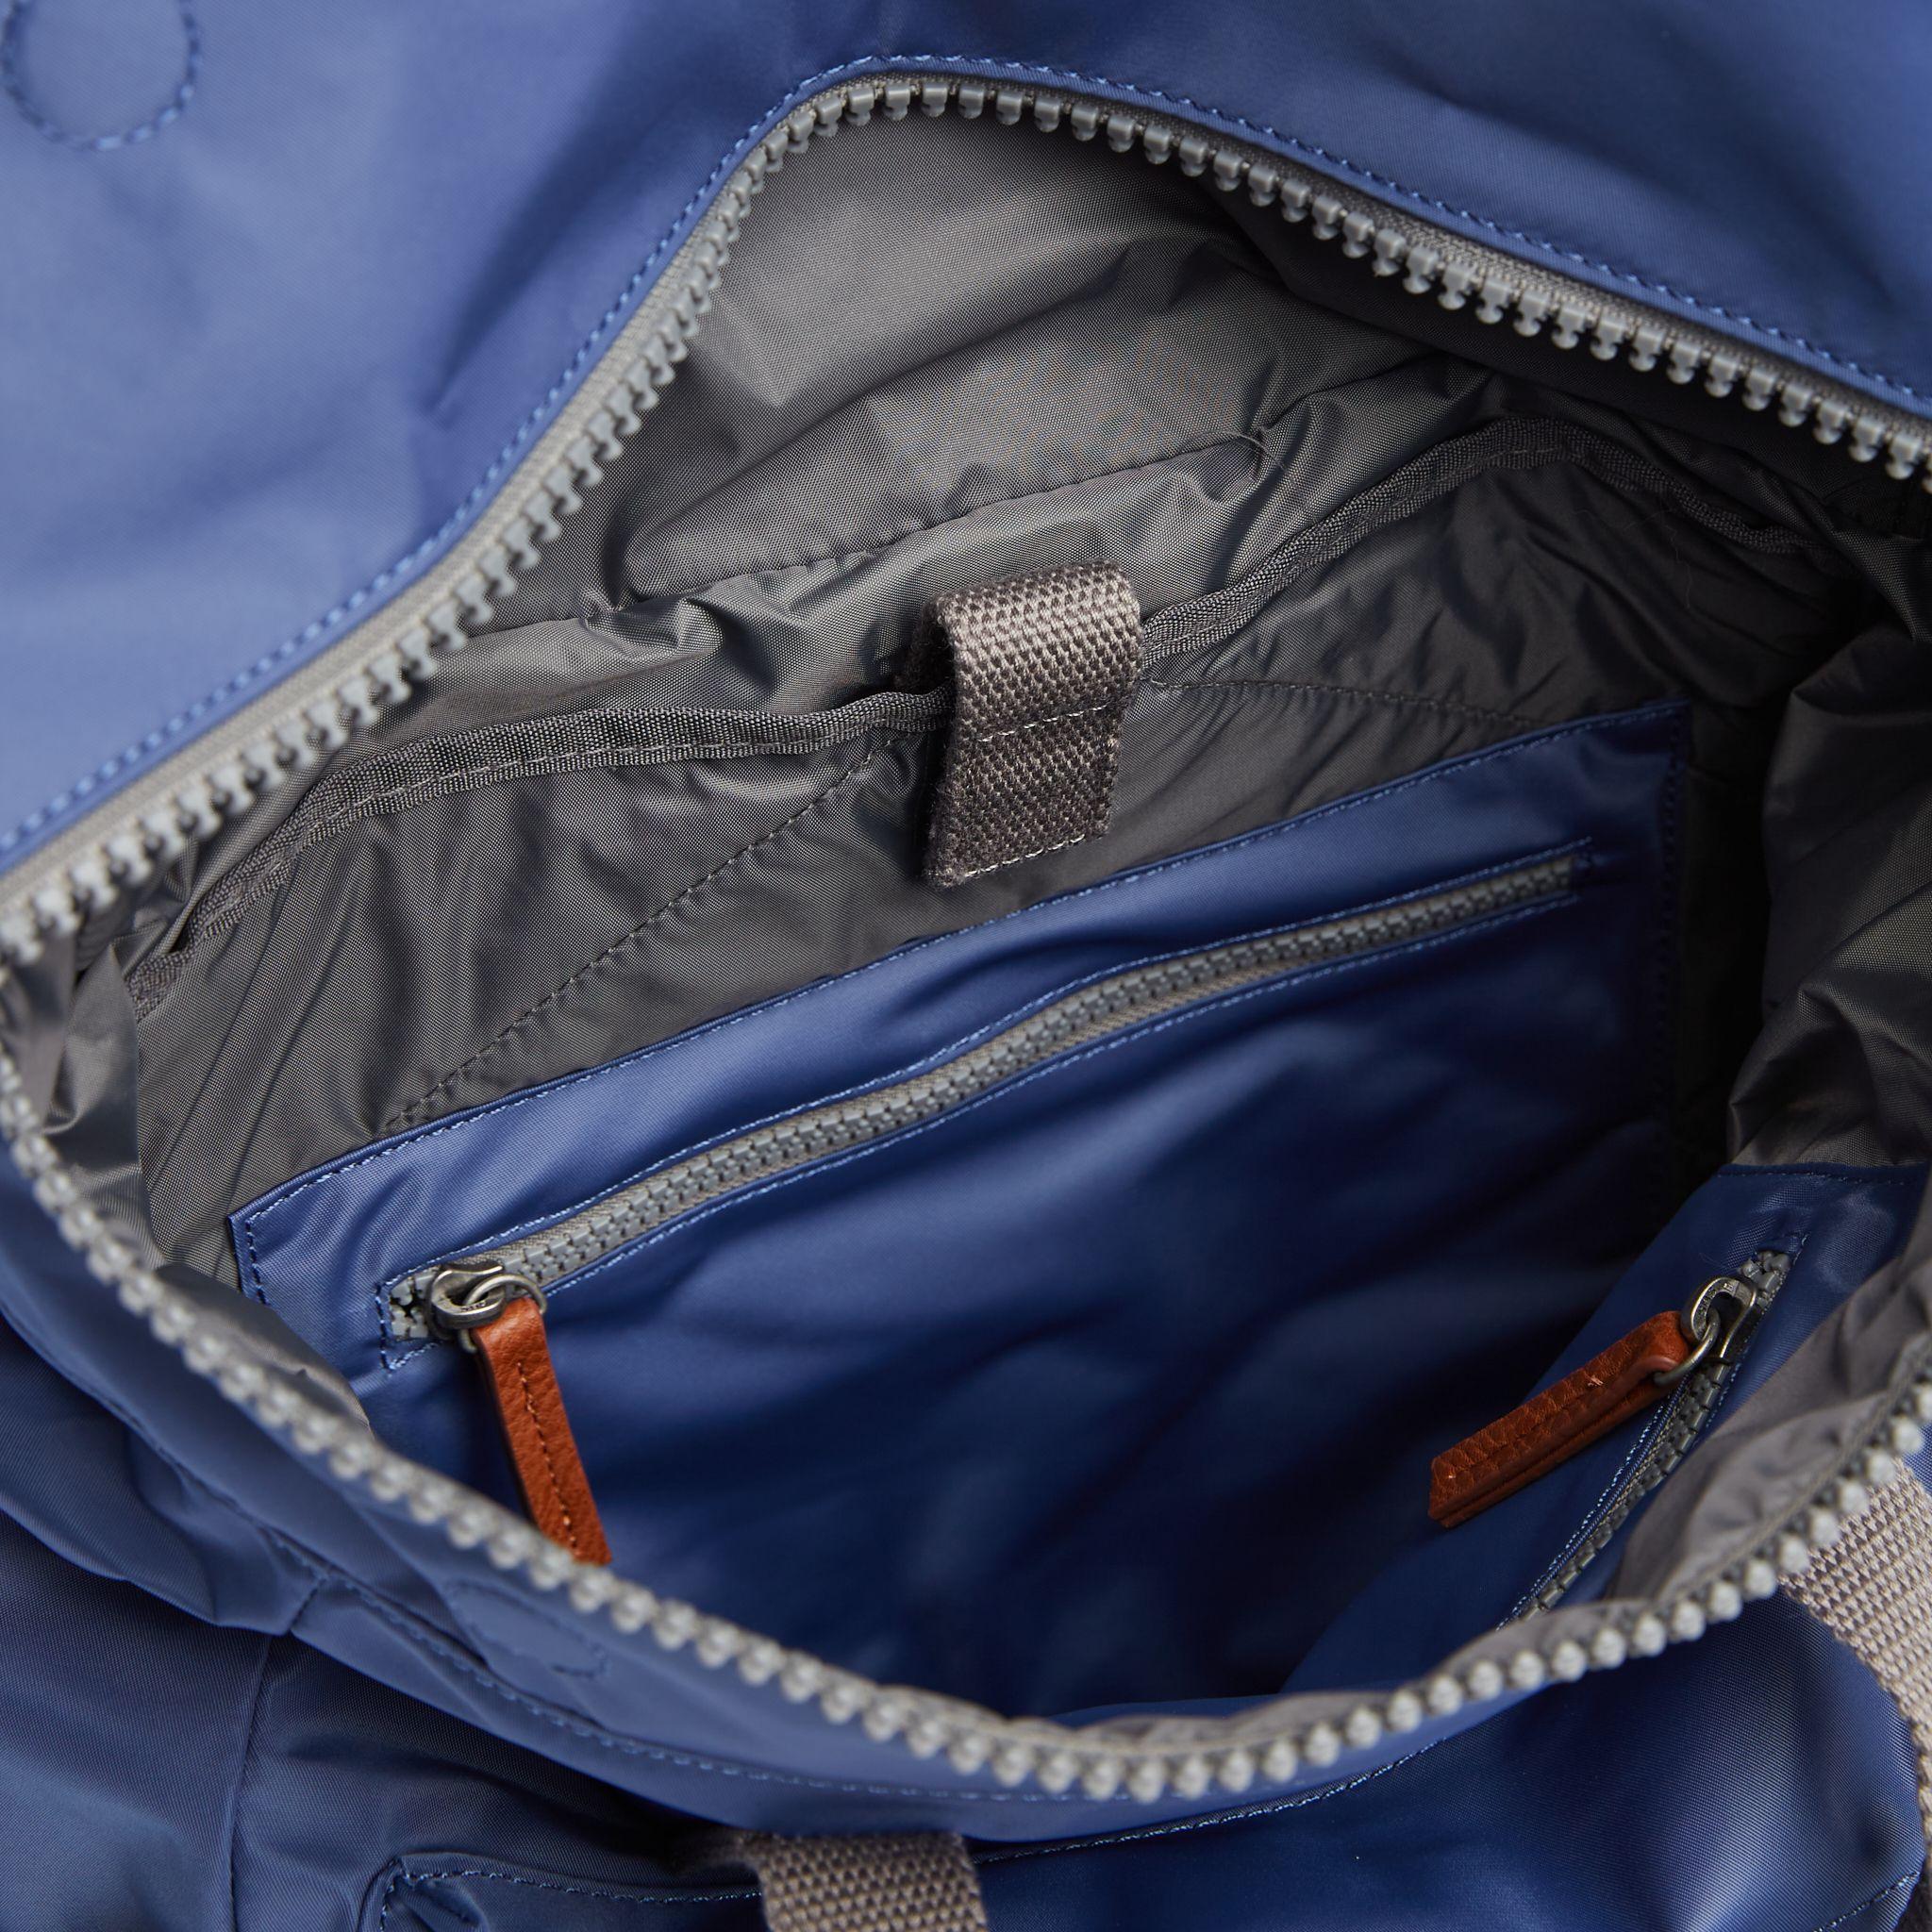 Roka Backpack - Canfield B Medium - Burnt Blue